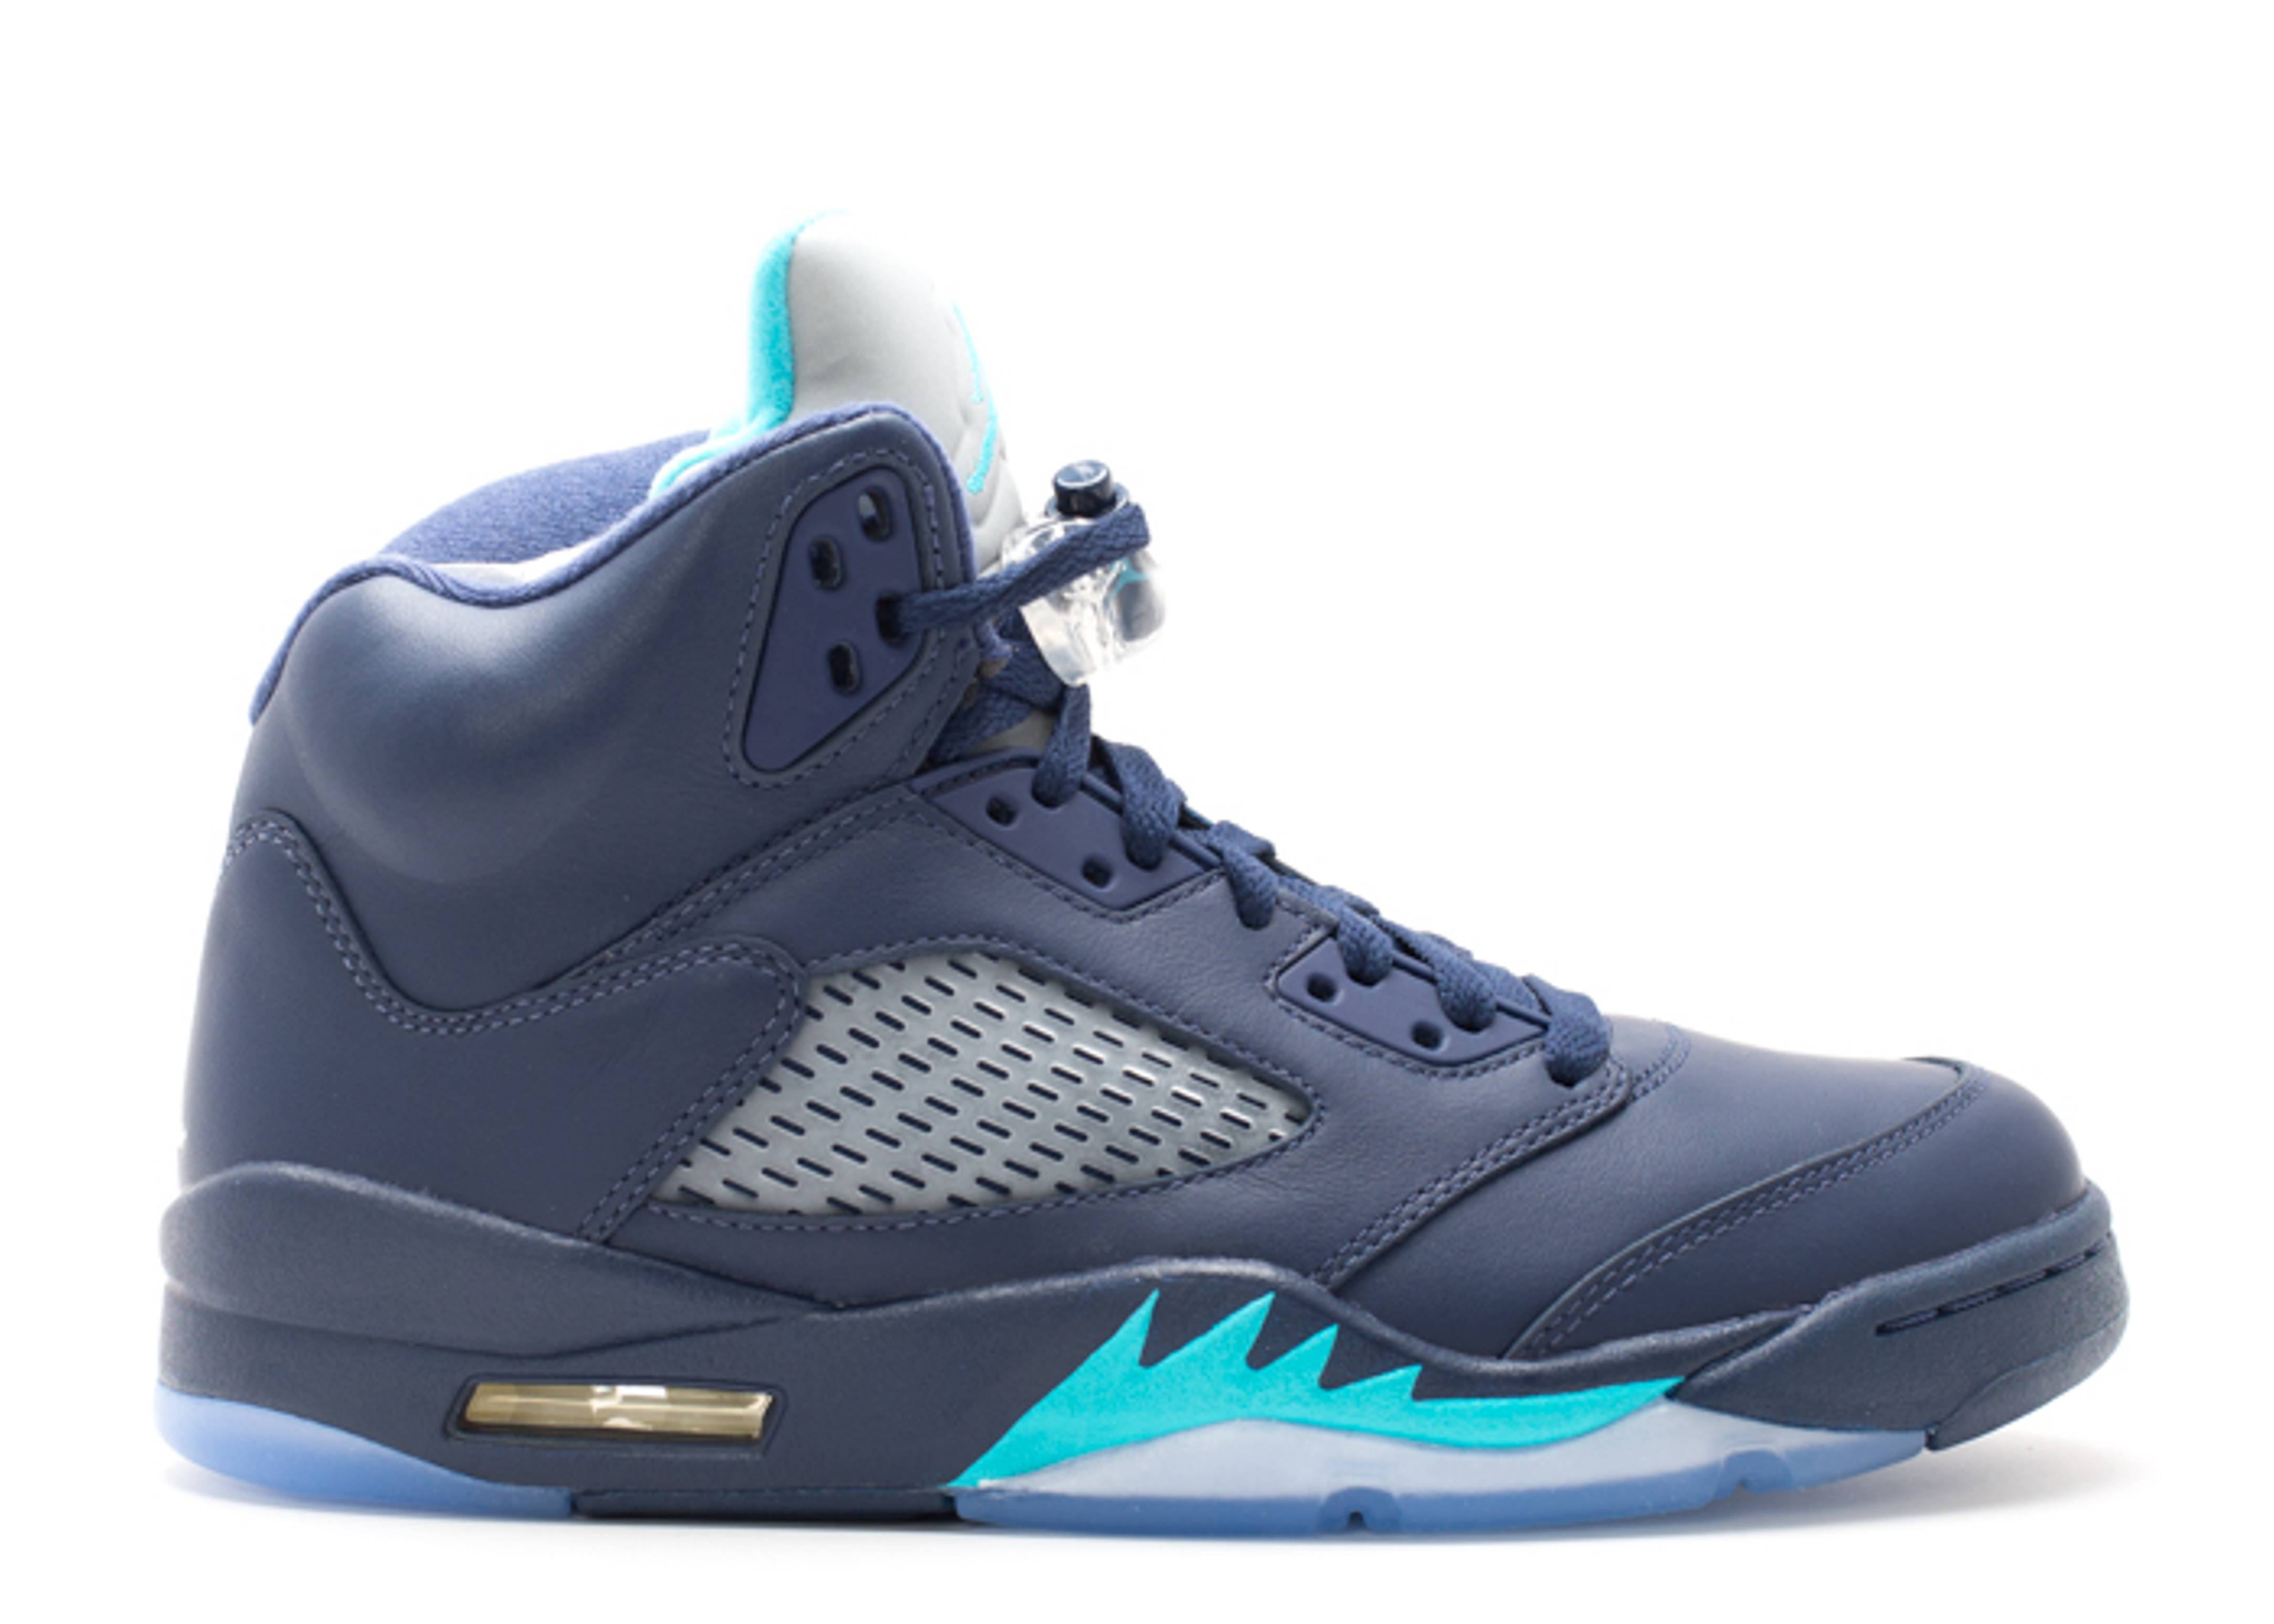 Air Jordans 5